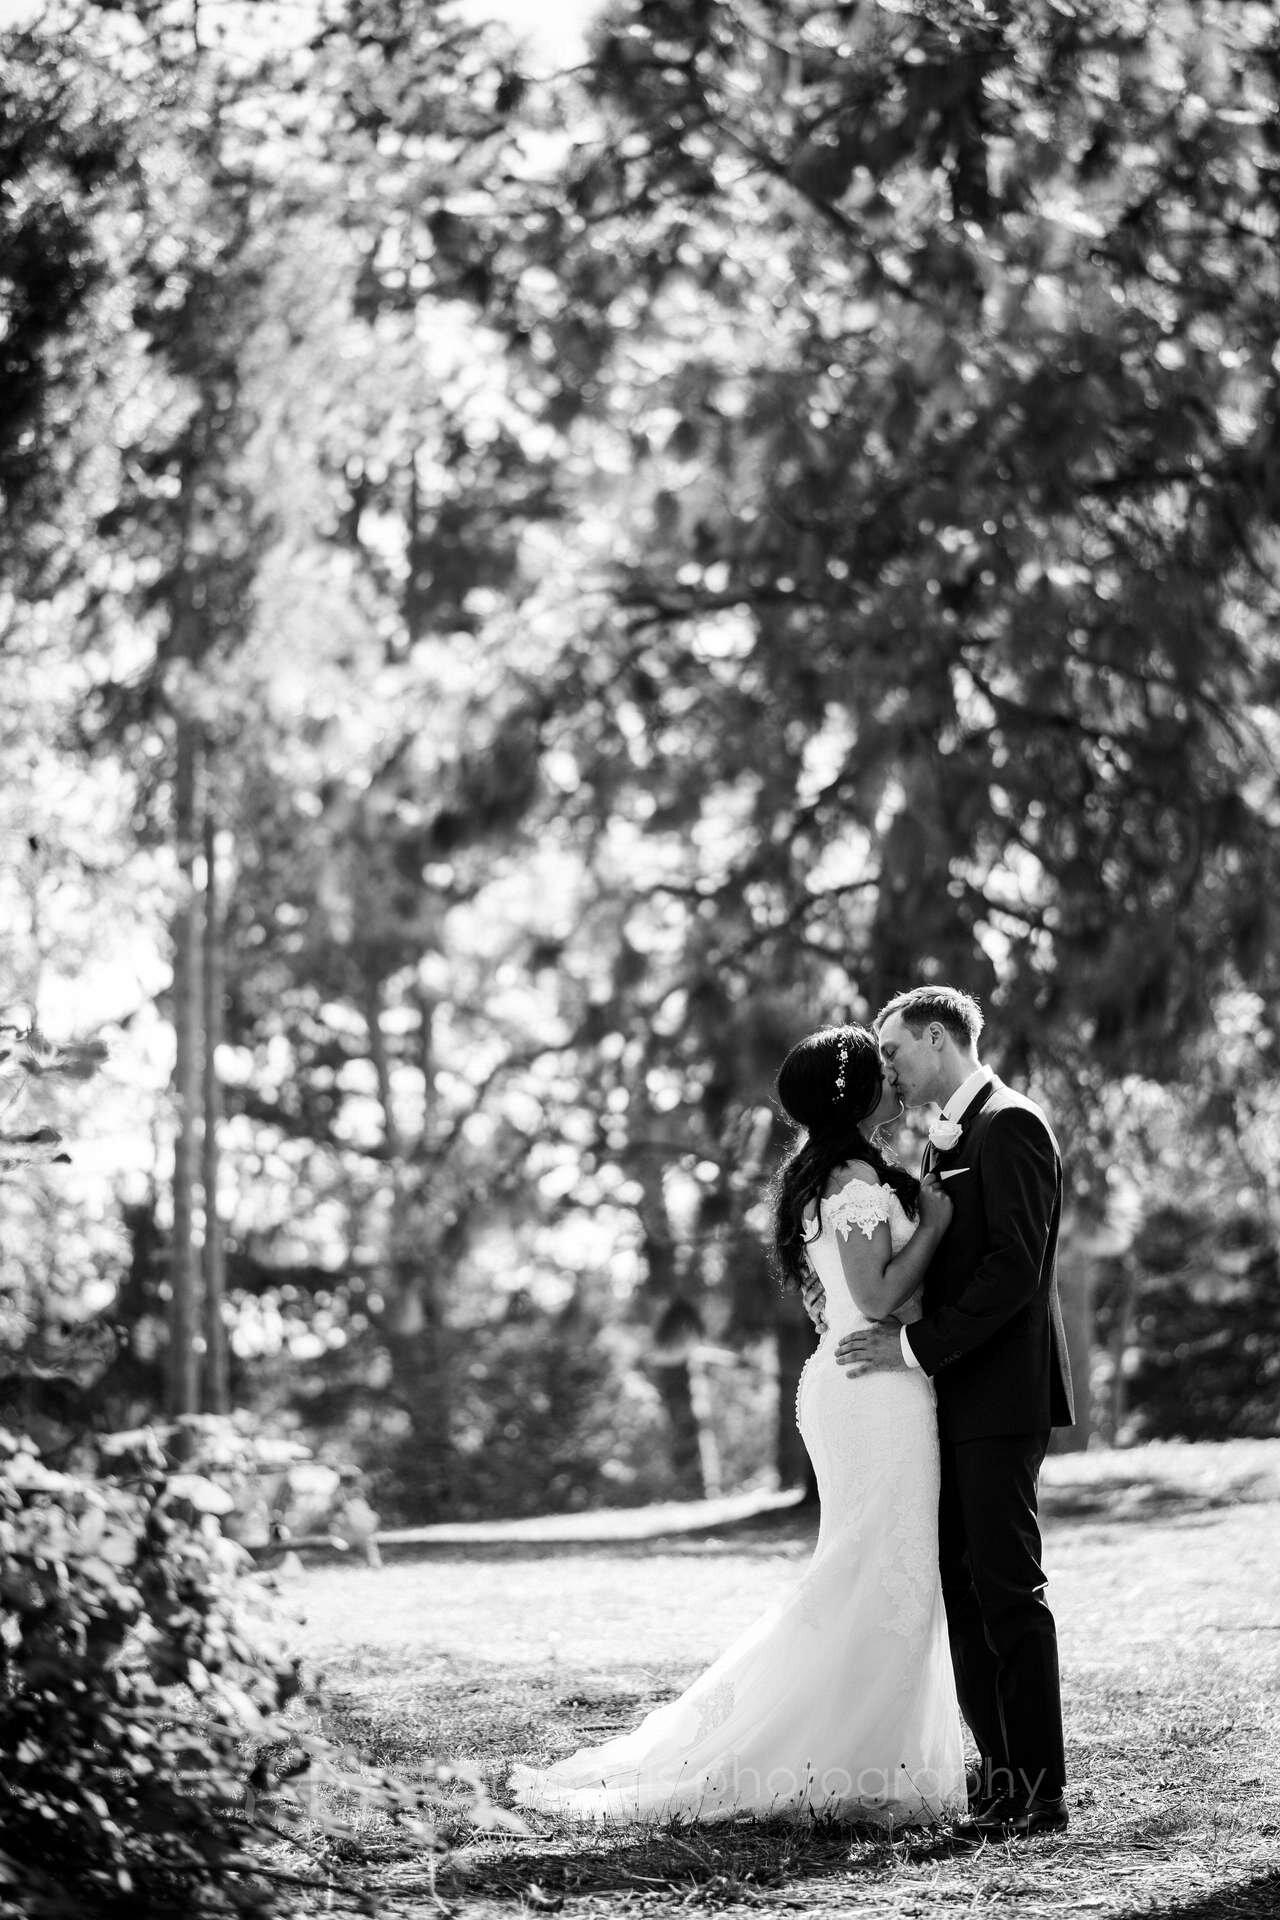 074-washington-park-arboretum-wedding.jpg